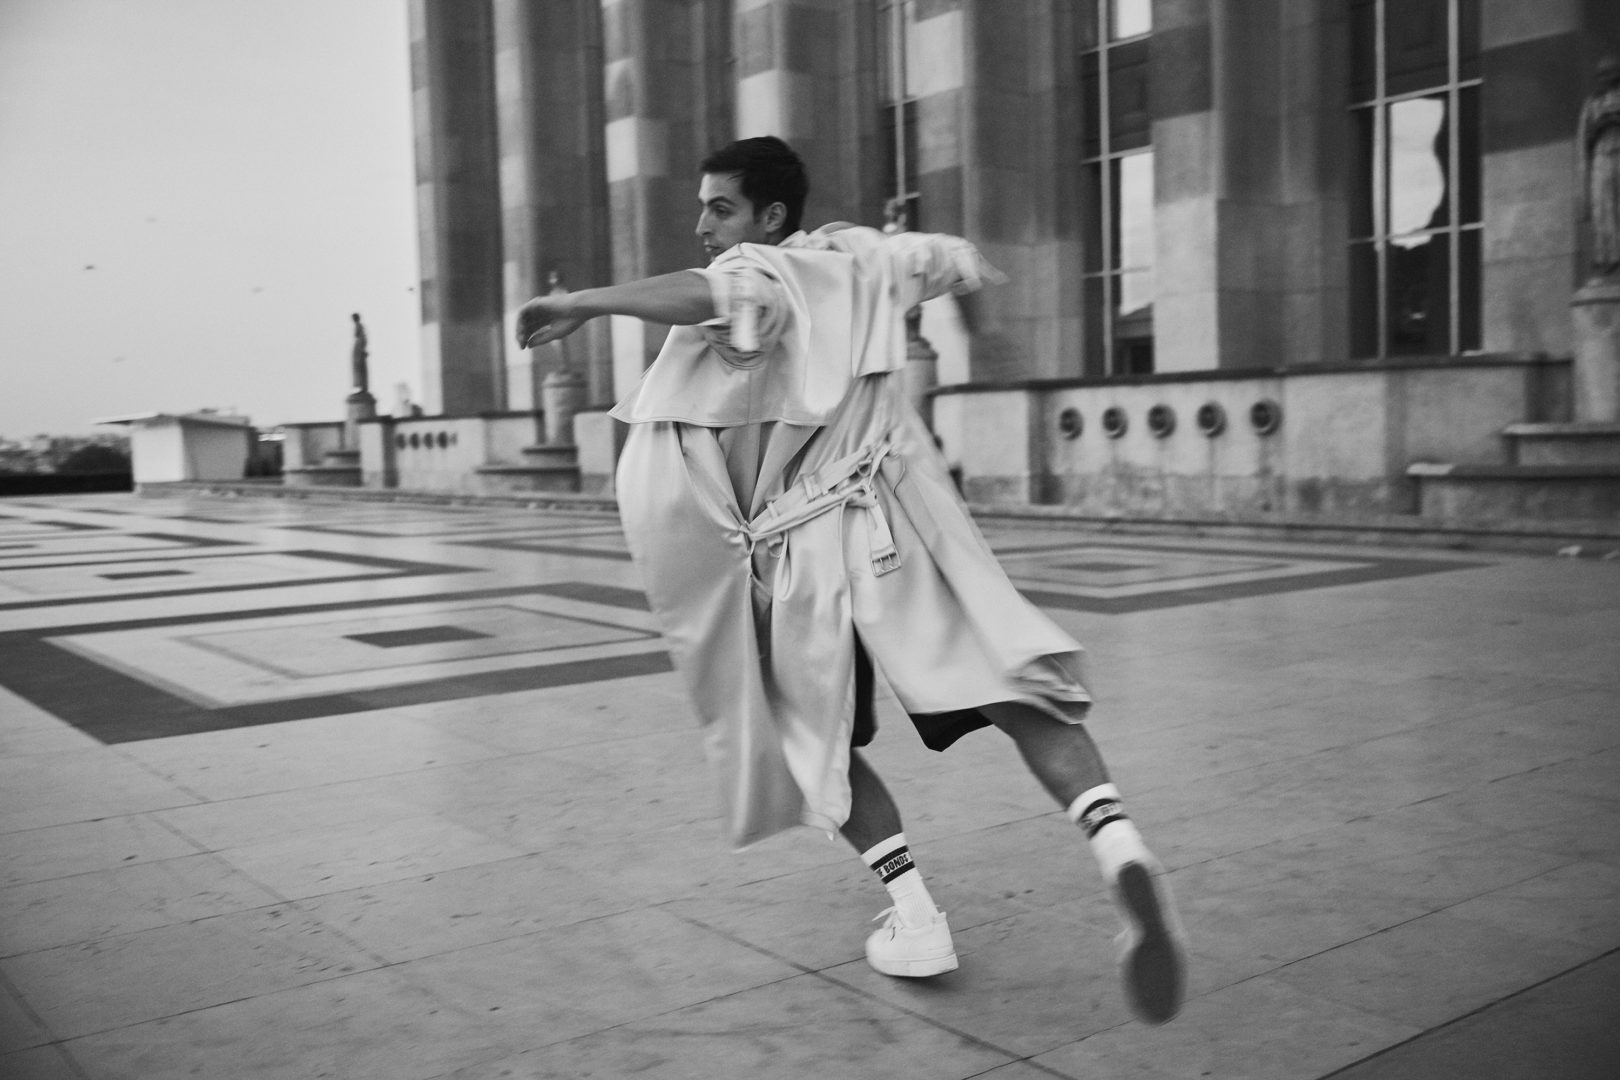 danser in Paris